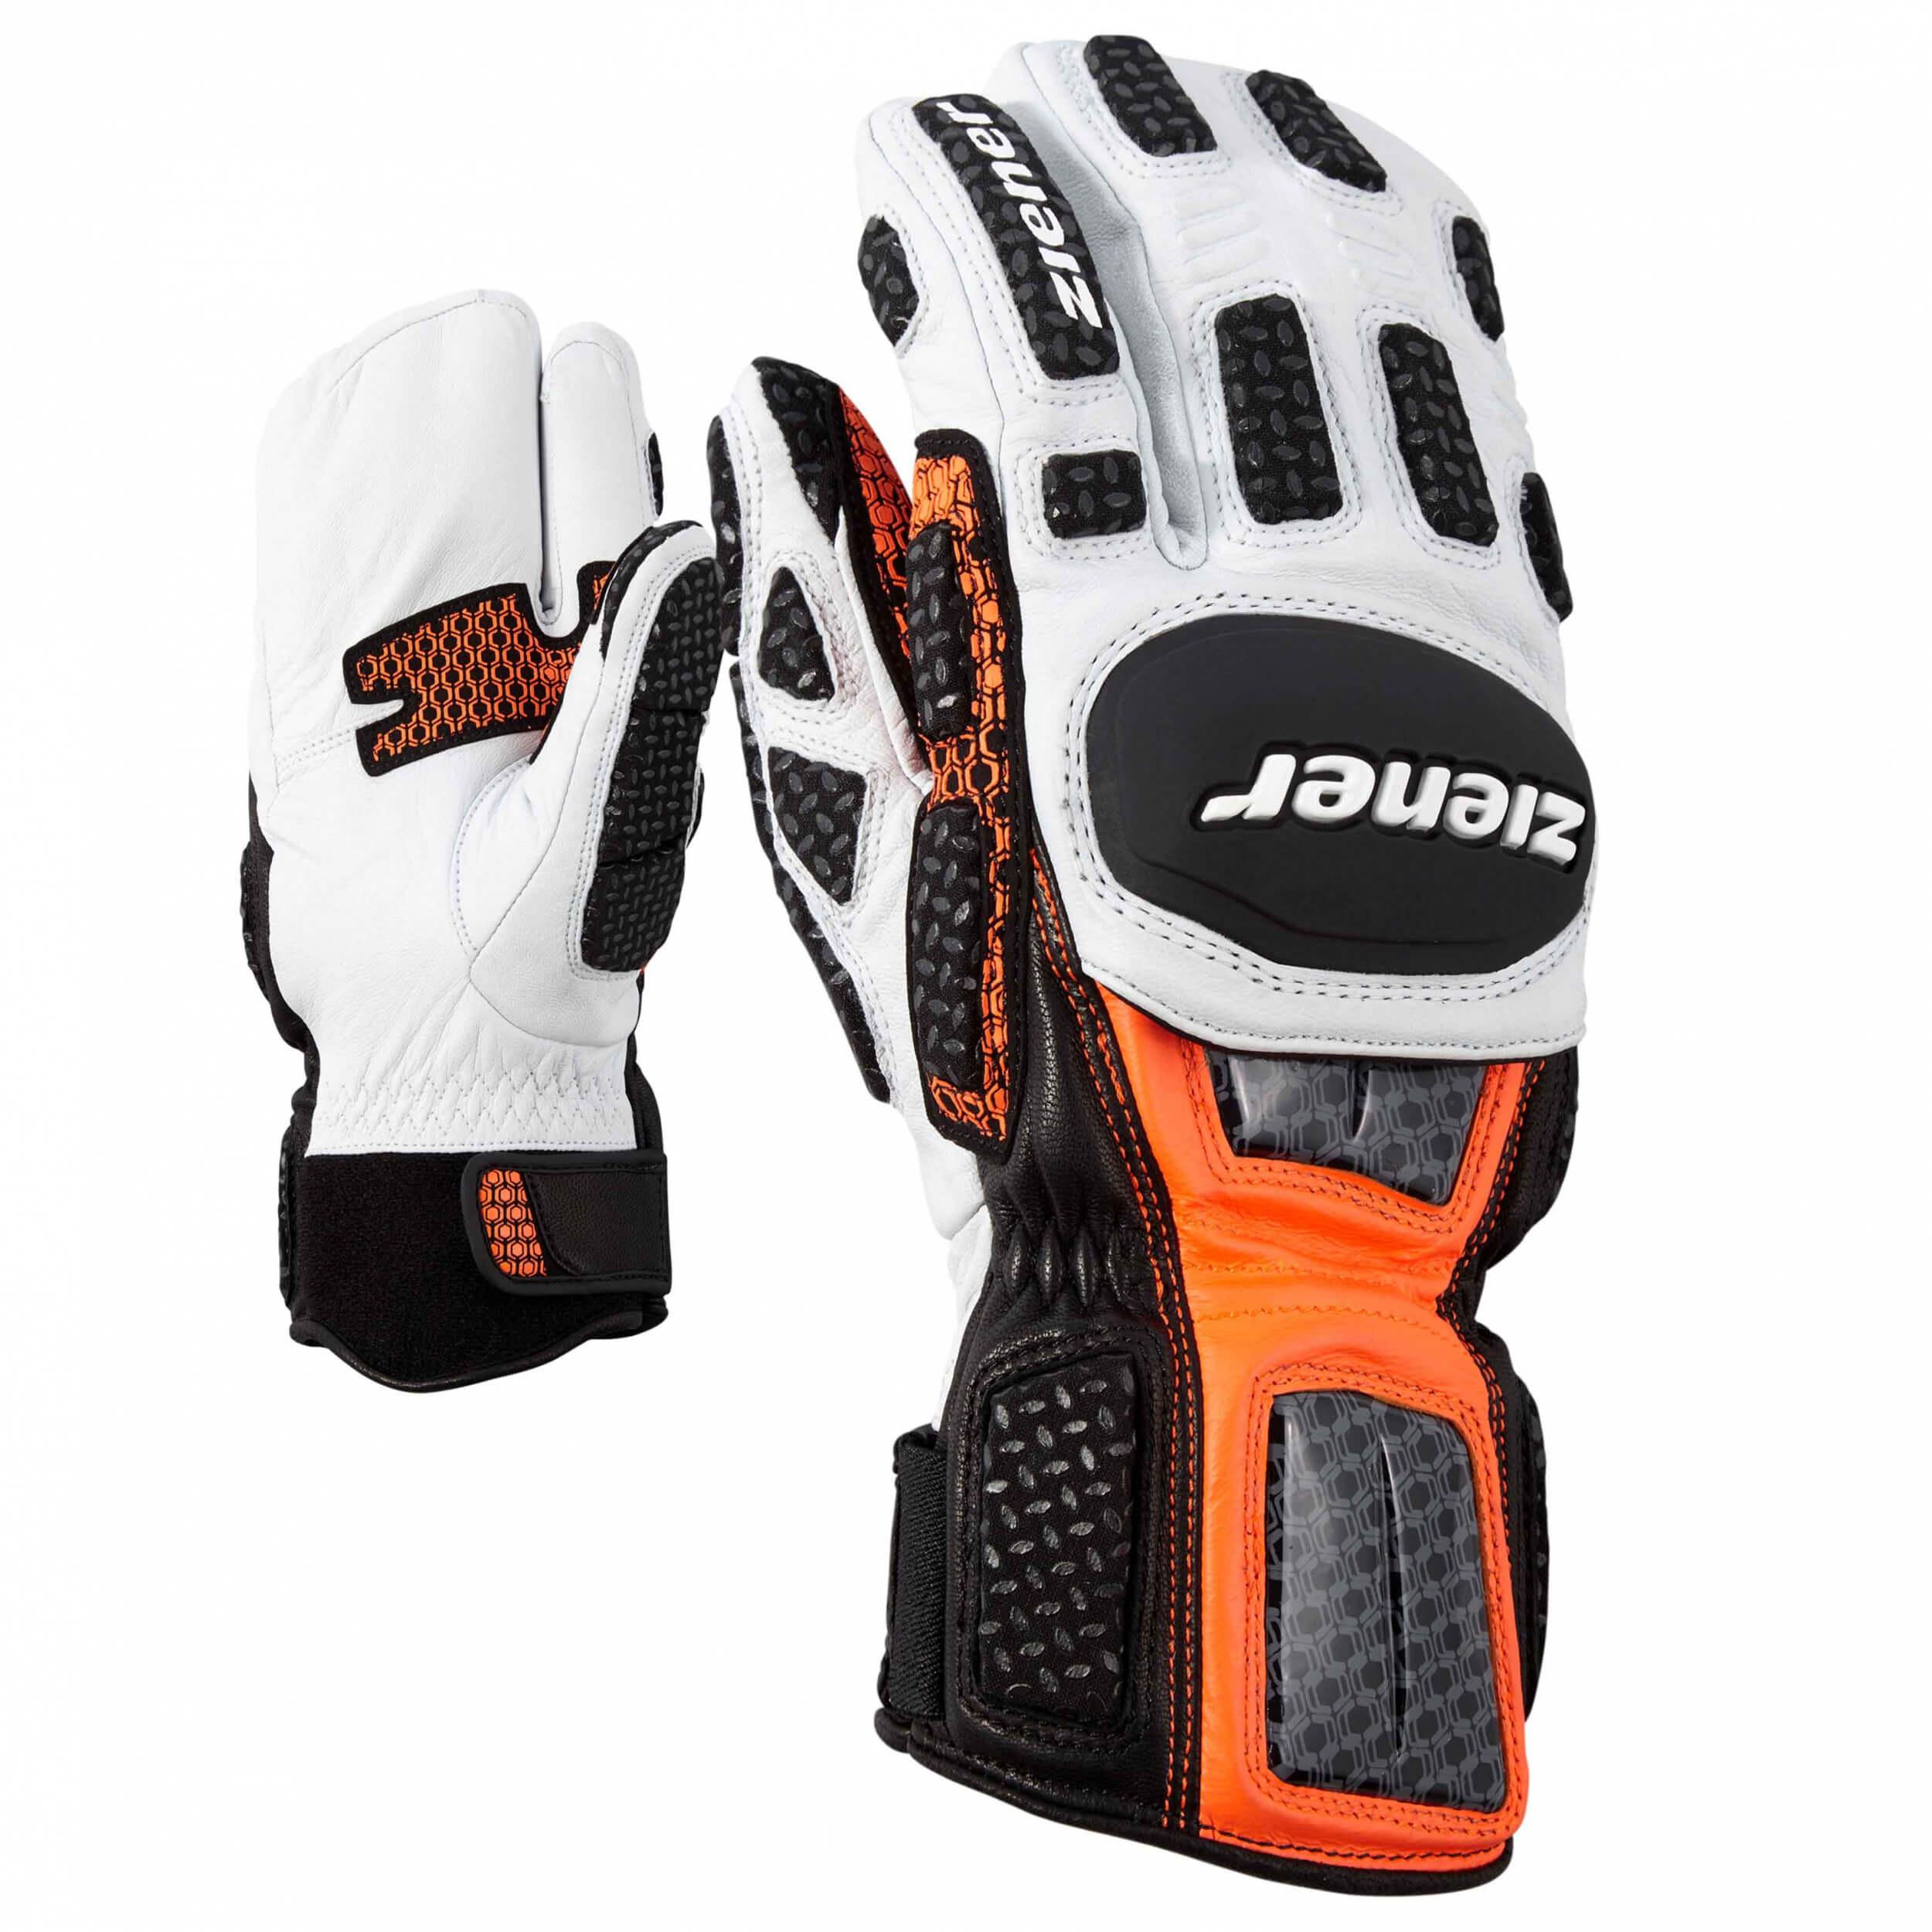 ZIENER Ski Race Handschuhe GS TECHNIK Lobster orange 738